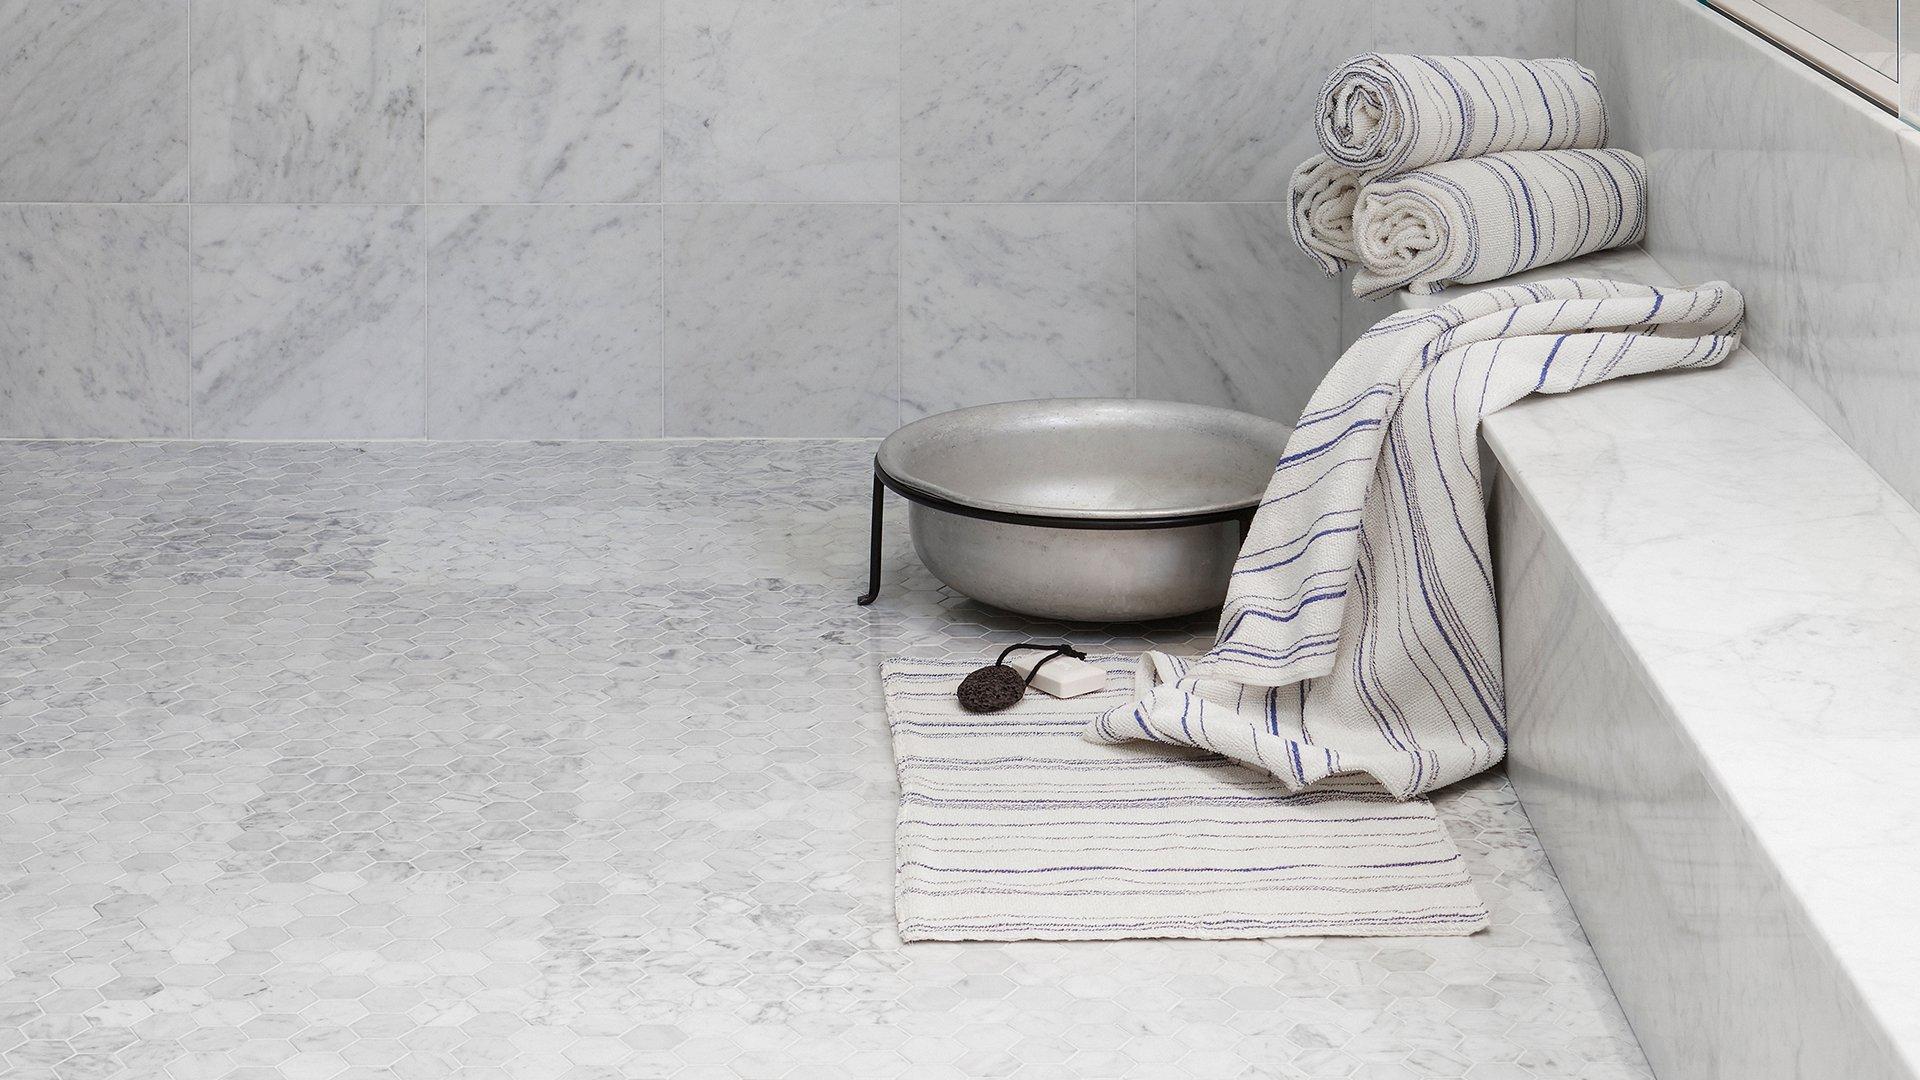 Tulikivi mosaiikit Carrara